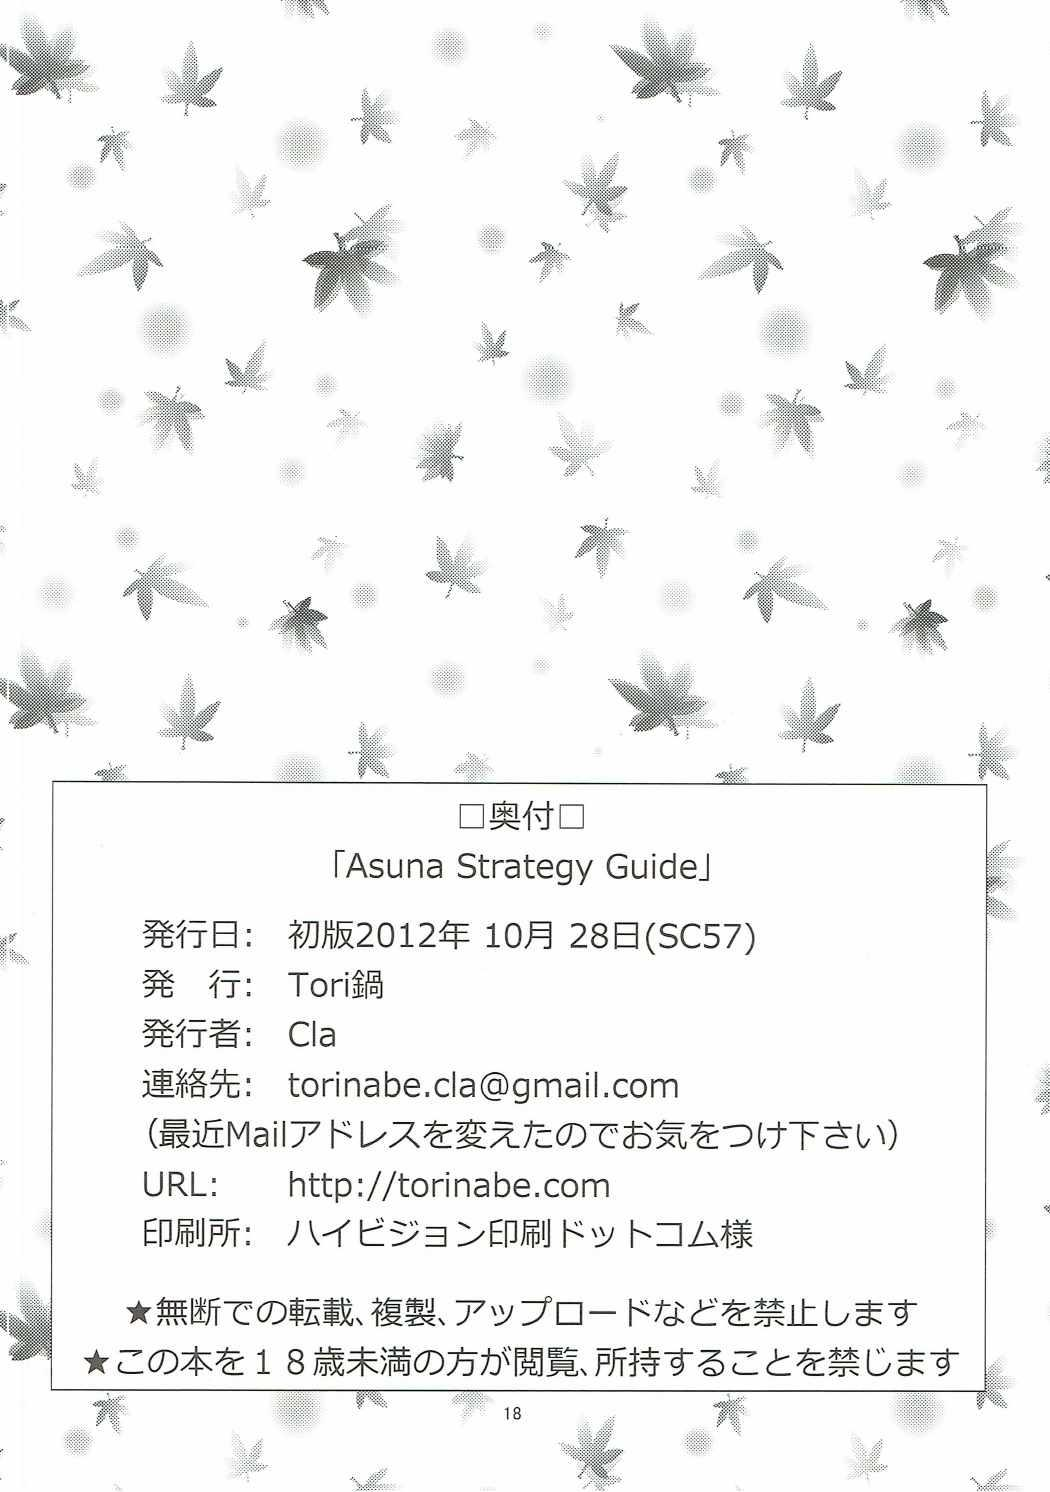 Asuna Strategy Guide 16